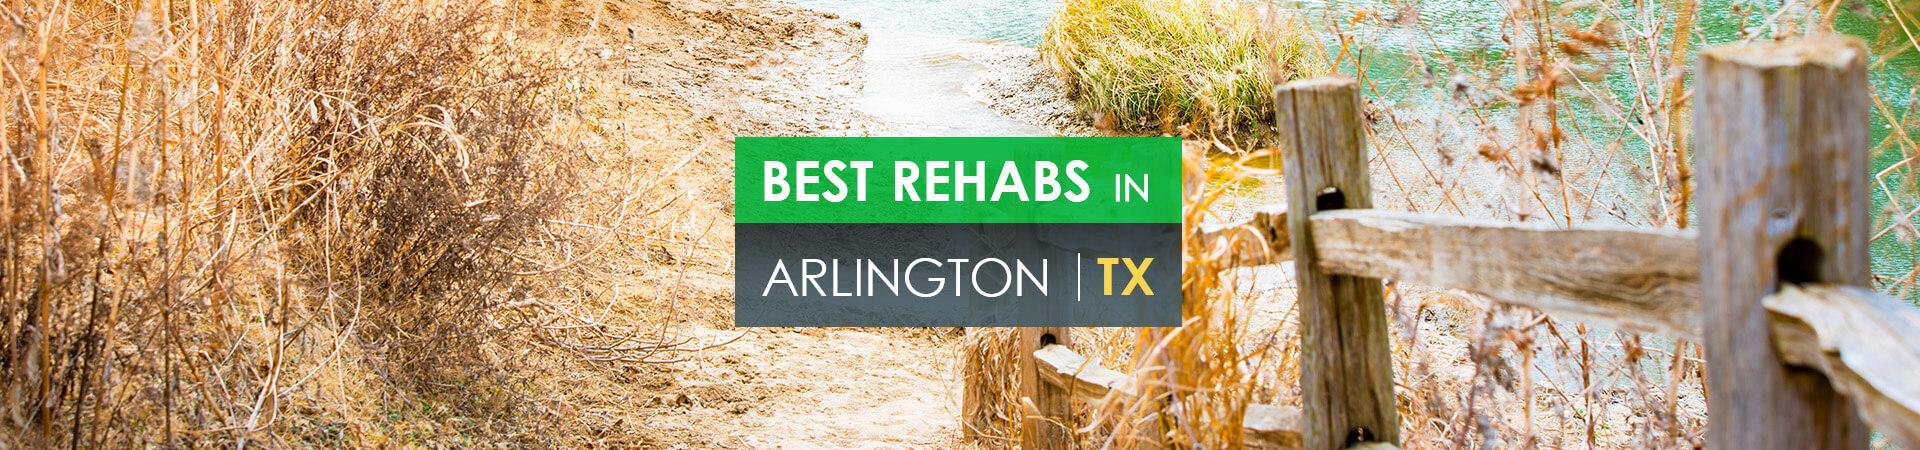 Best rehabs in Arlington, TX